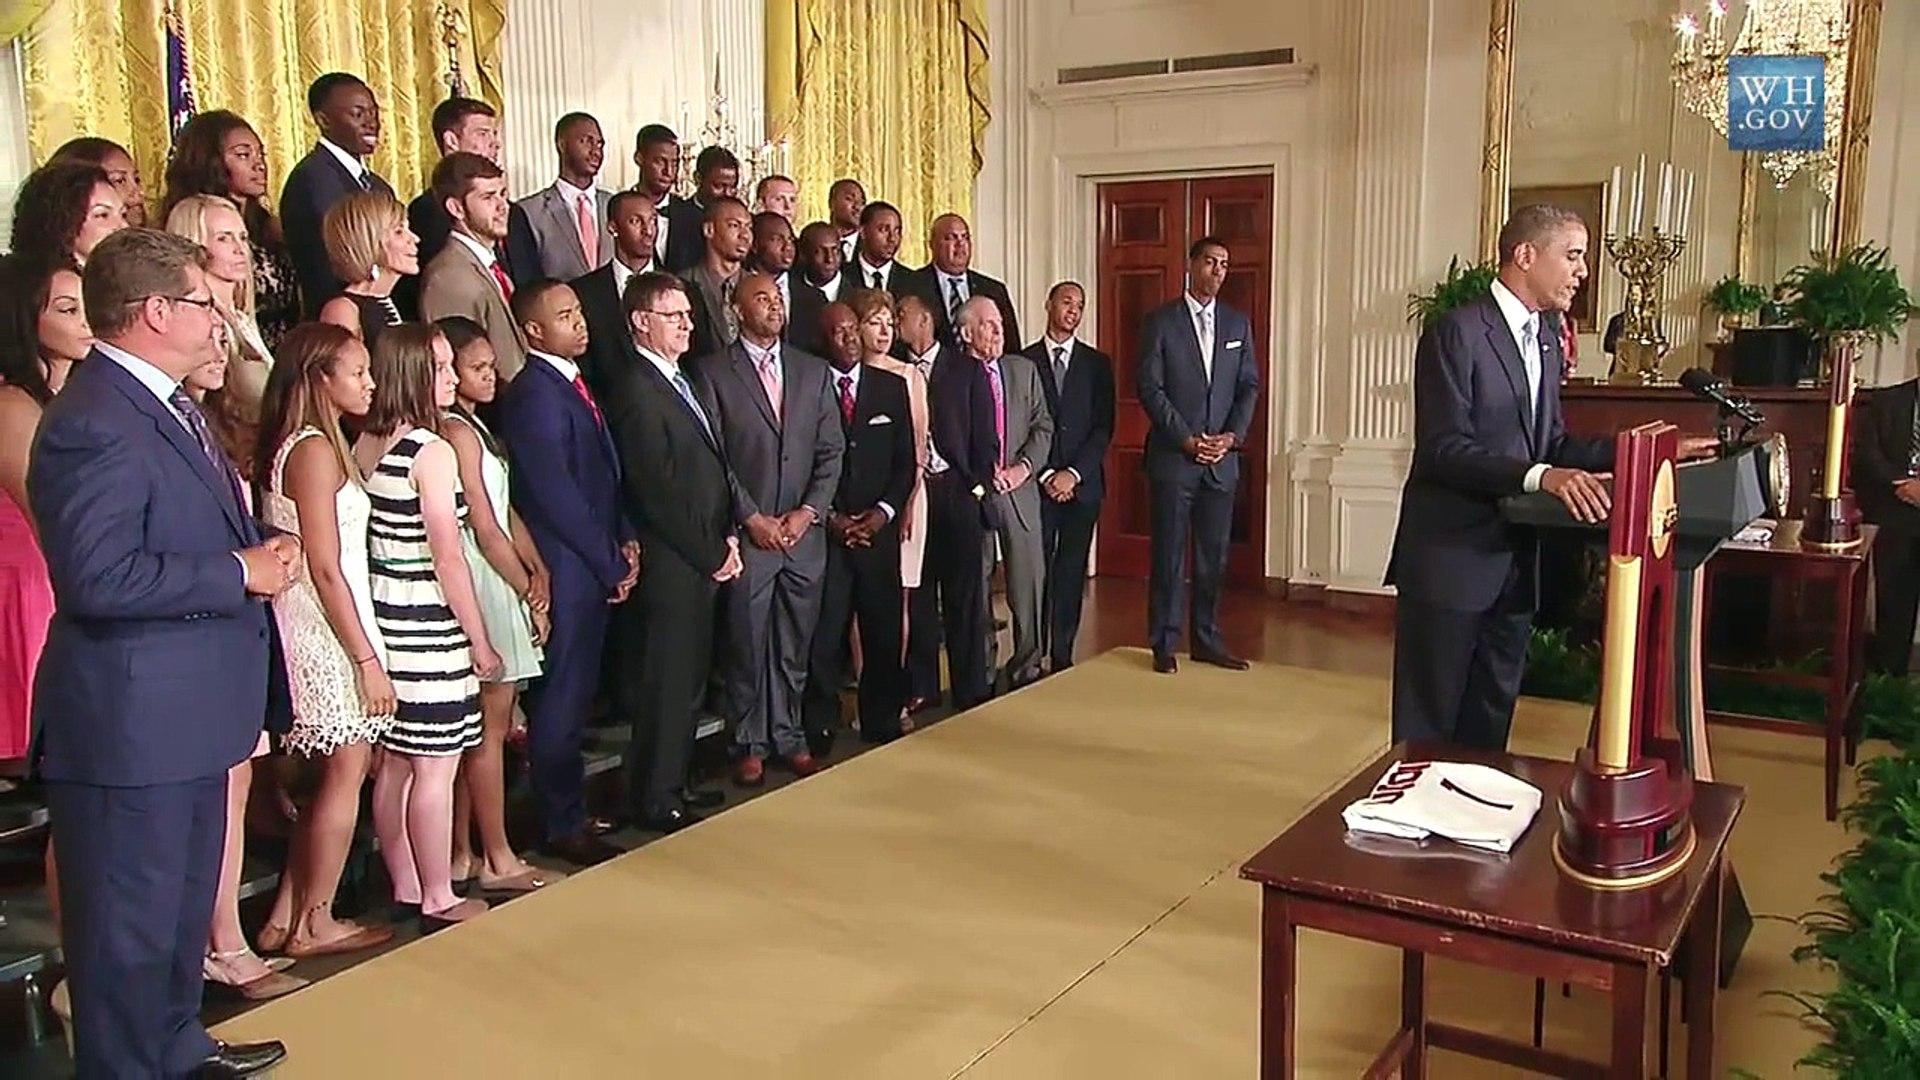 The UConn Huskies Visit the White House